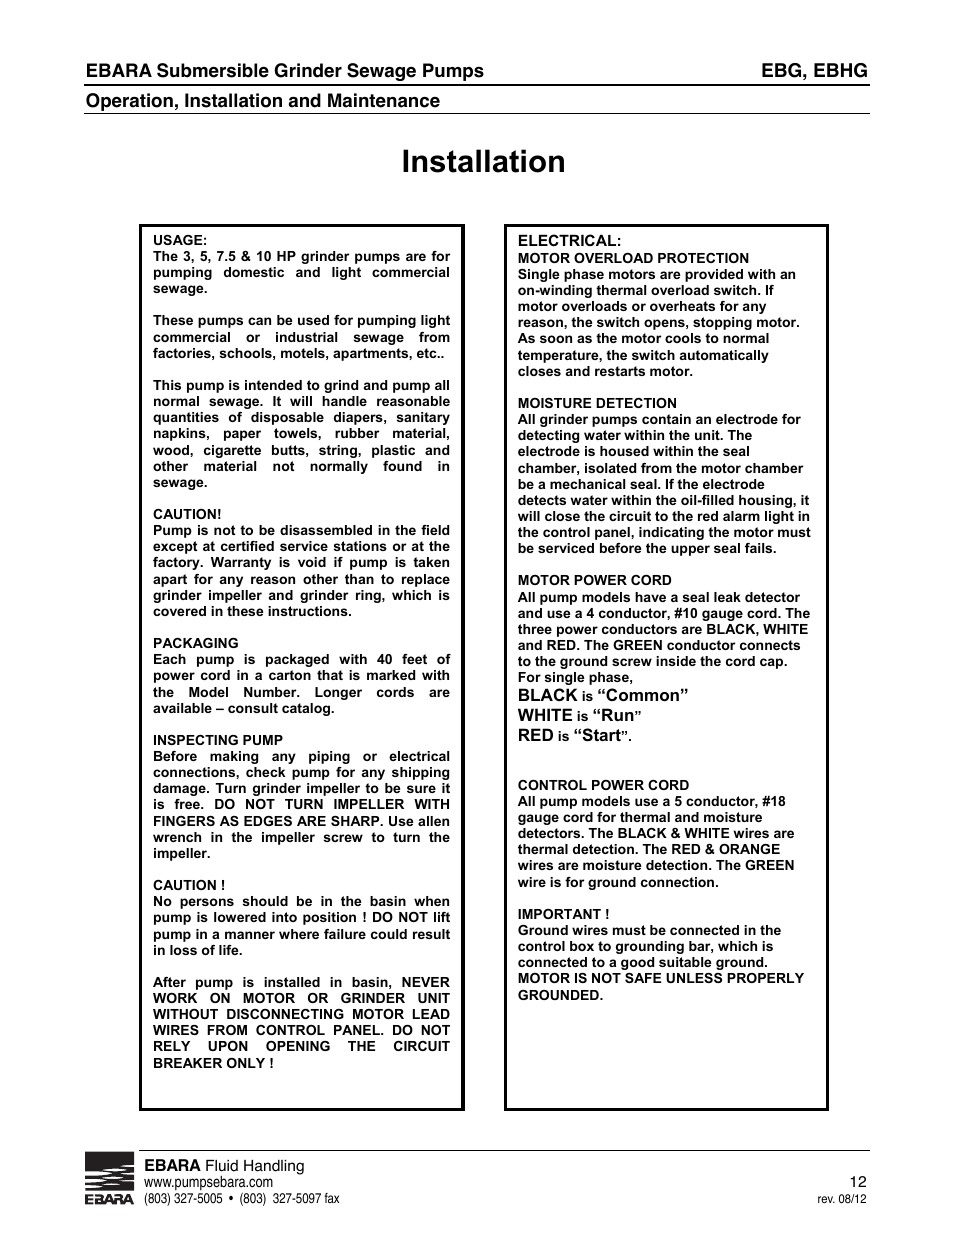 Installation | EBARA EBHG User Manual | Page 12 / 32